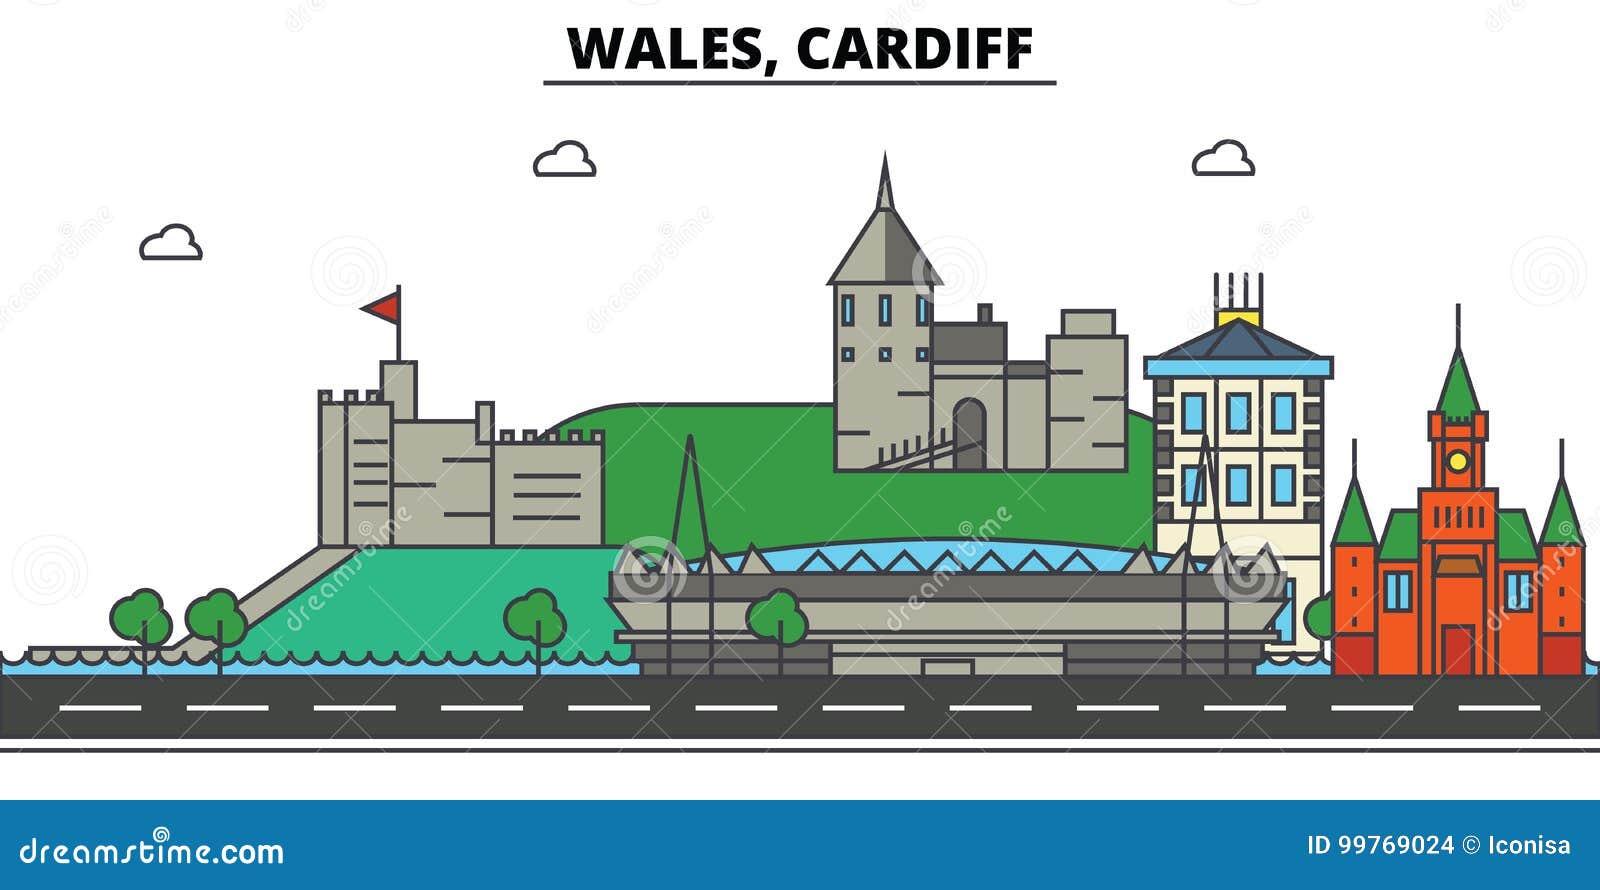 Wales, Cardiff De architectuur van de stadshorizon editable